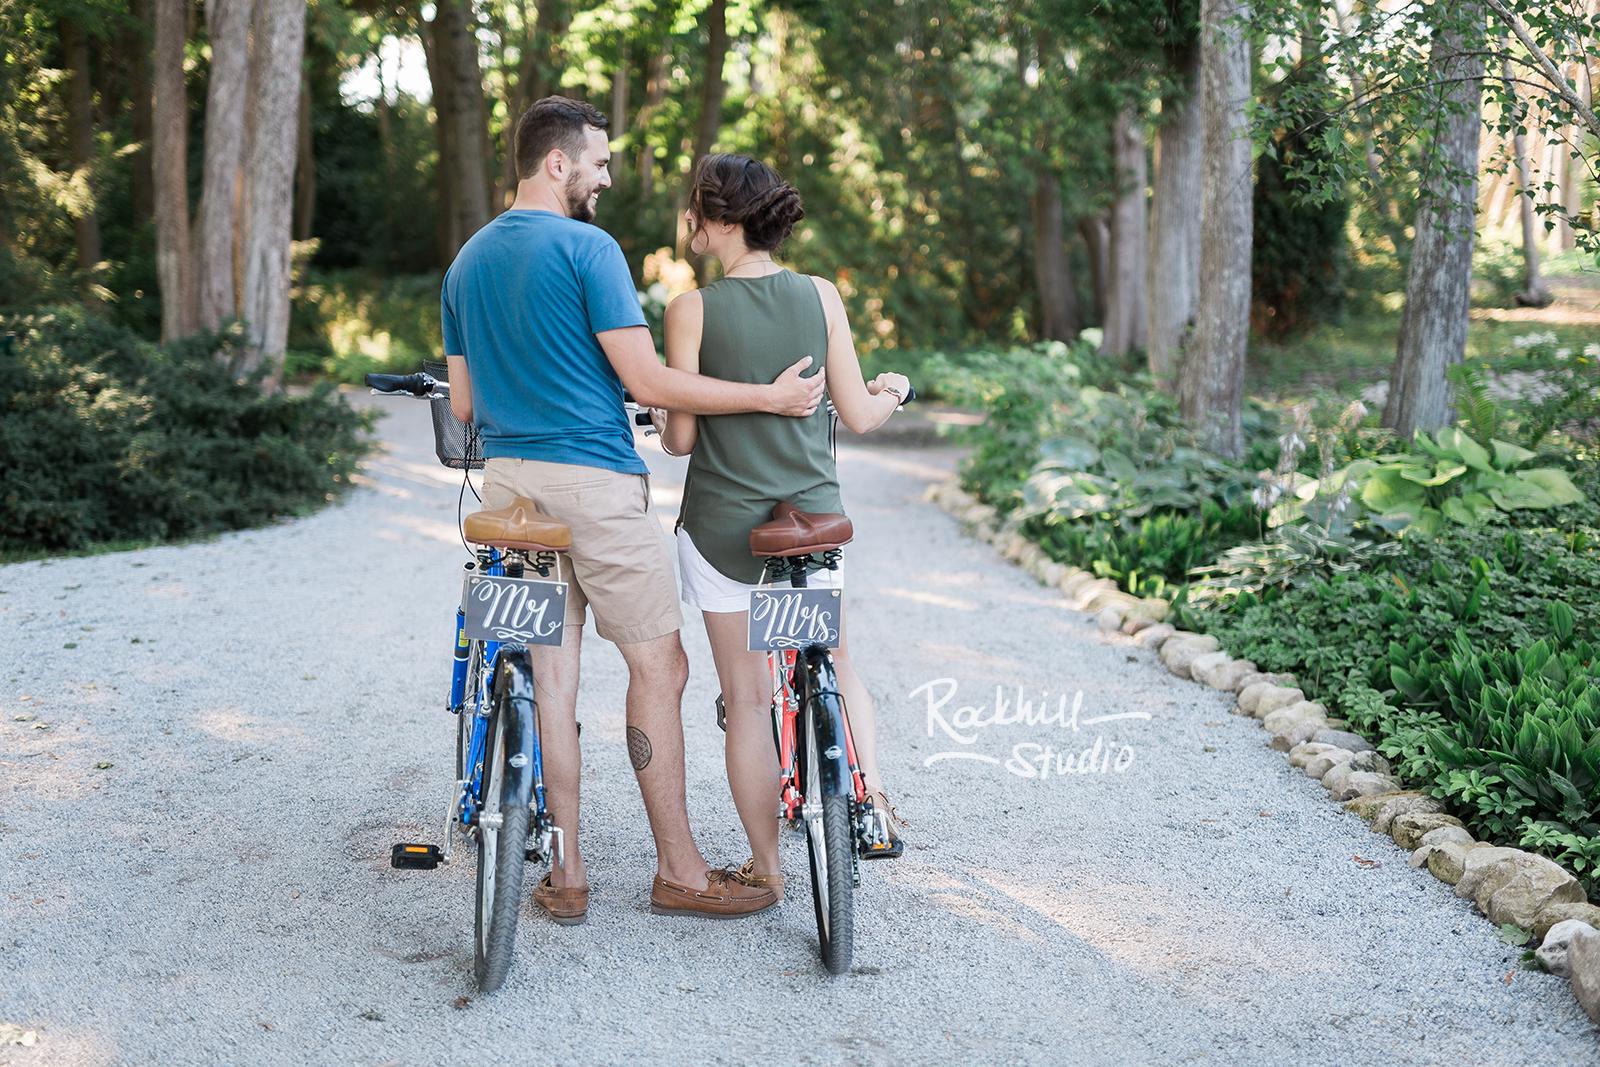 mackinac-island-wedding-engagement-northern-michigan-rockhill-studio-jt-17.jpg